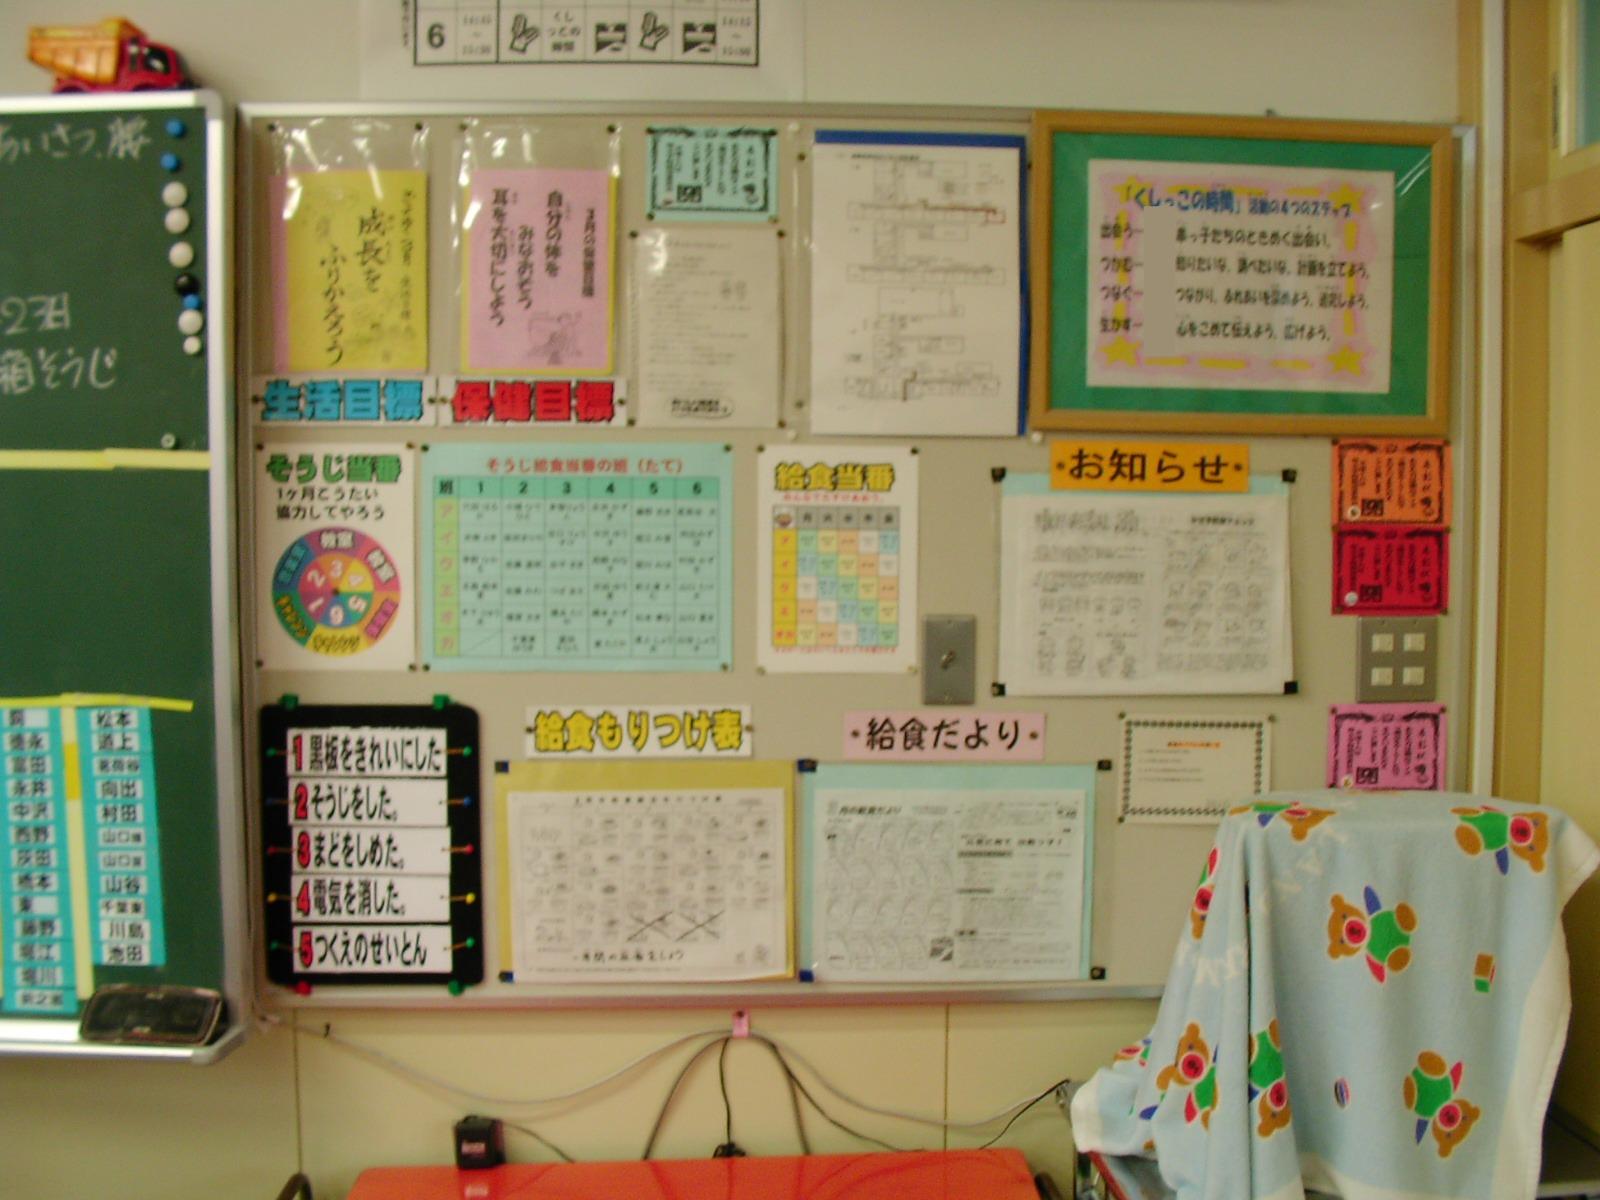 漢字 6年漢字 : SANY0085.JPG: 教室の掲示物 ...